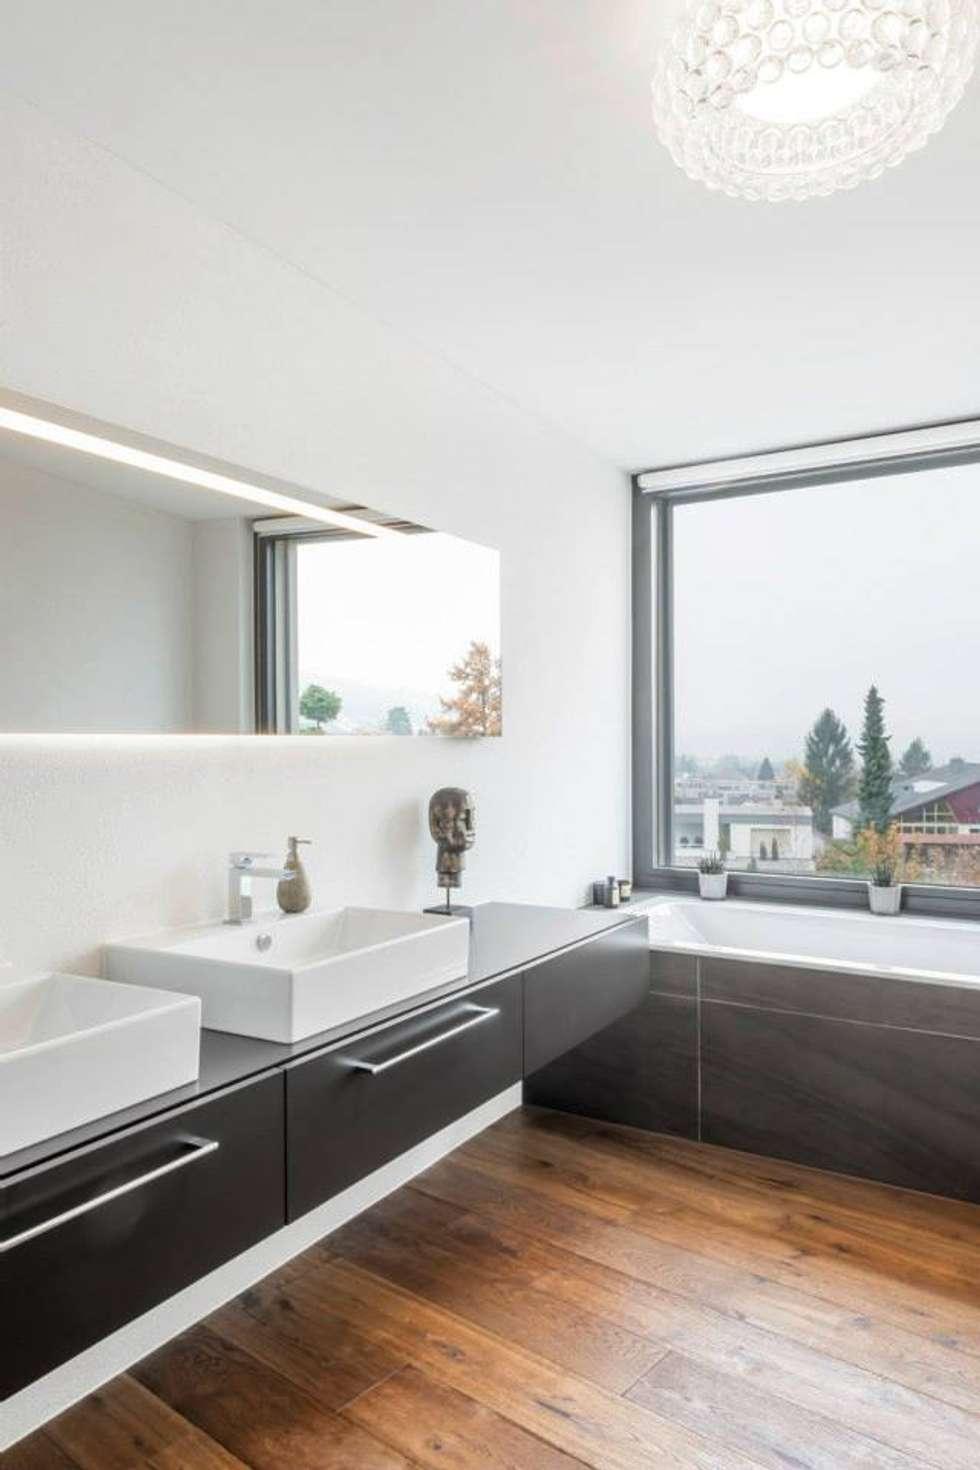 foto di bagno in stile in stile moderno di marty h user ag. Black Bedroom Furniture Sets. Home Design Ideas